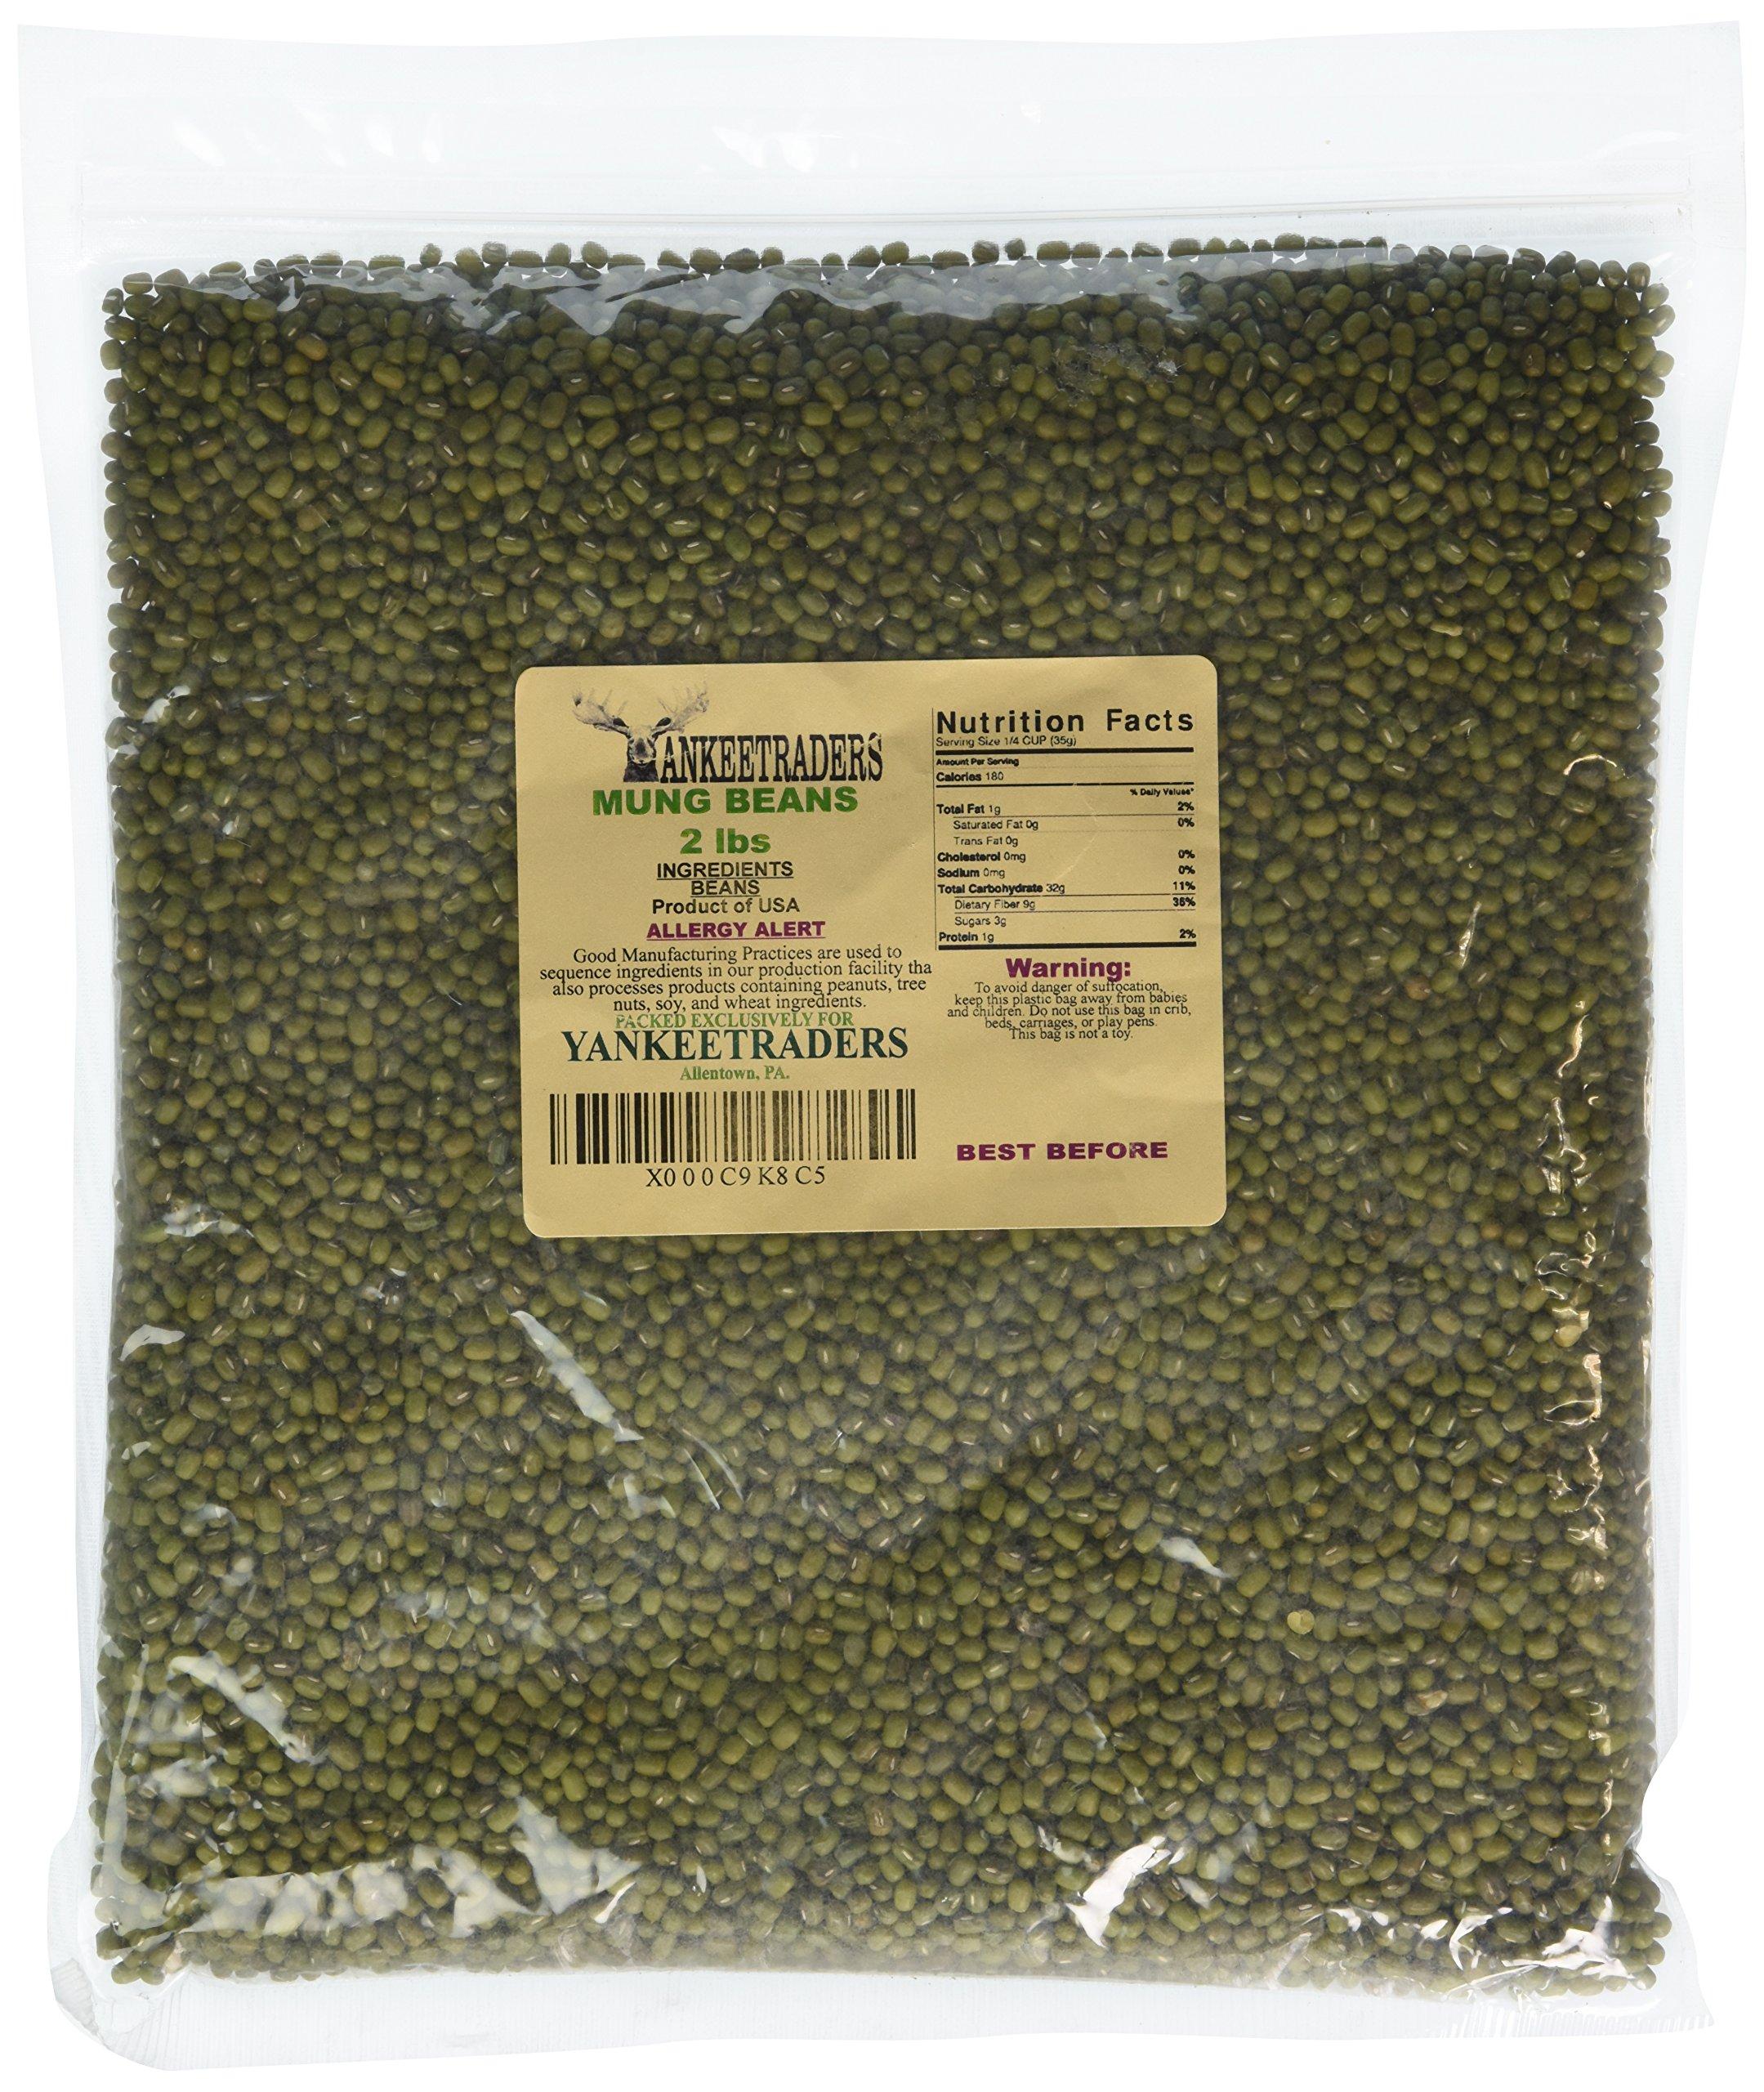 Mung Beans / Yankee Trader Net llc Brand - 2 Lbs by YANKEETRADERS